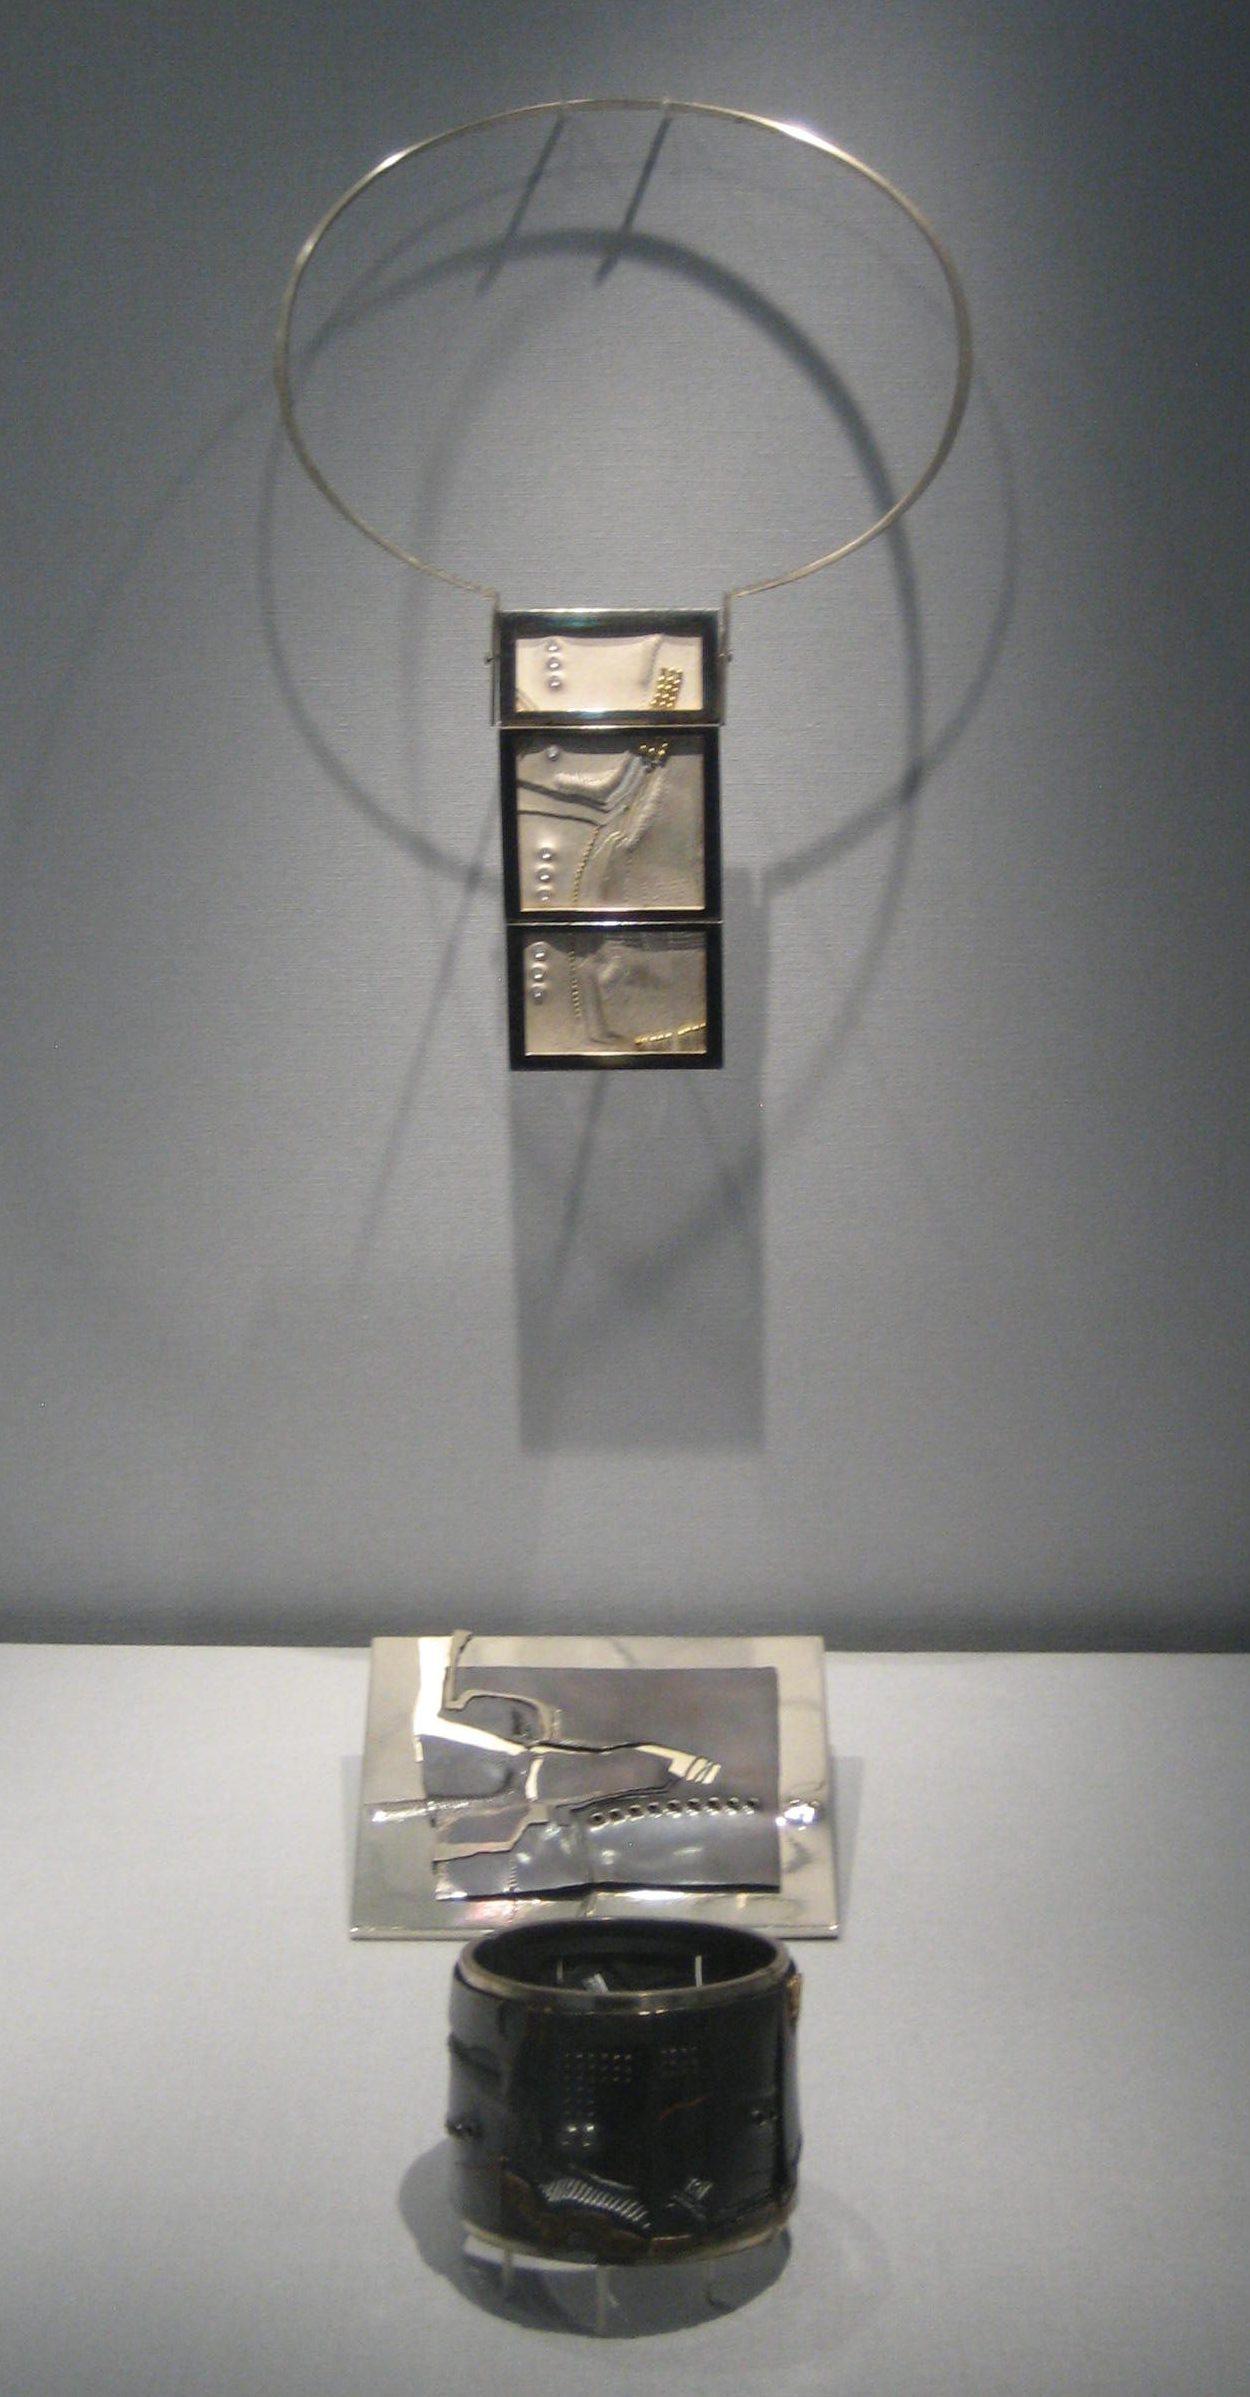 Rüdiger Lorenzen, halssieraad, 1971, object, 1970, armband, 1969. Collectie Schmuckmuseum Pforzheim. Foto Coert Peter Krabbe, mei 2019, zilver, goud, vitrine,